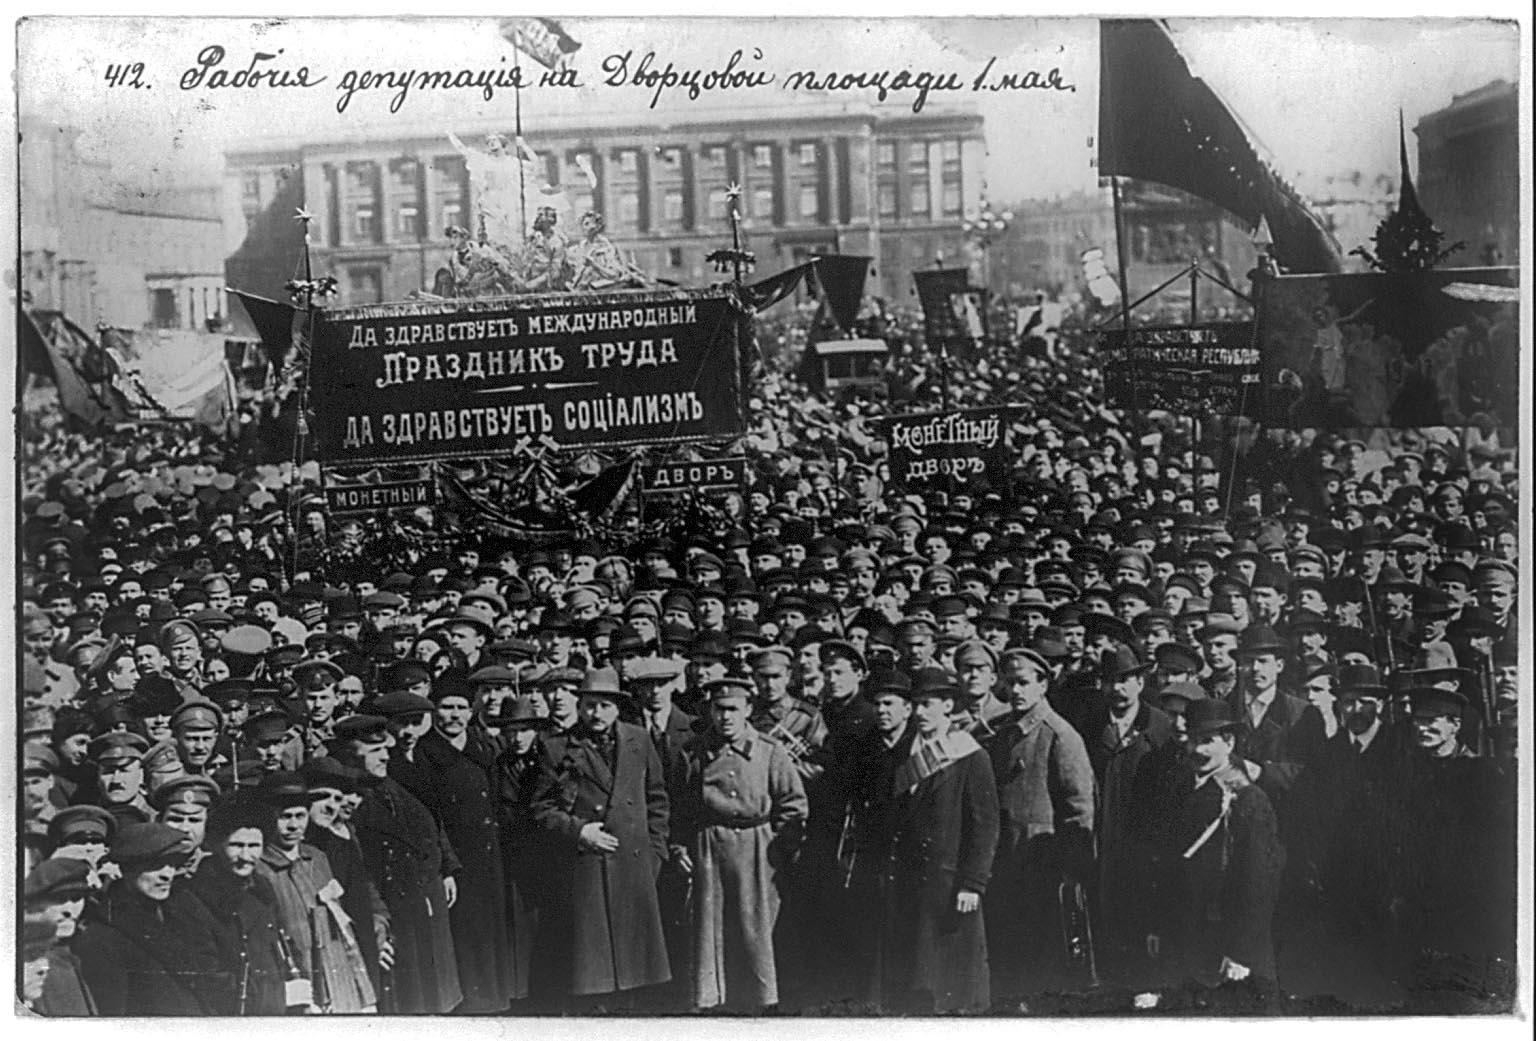 22Рабочая депутация на Дворцовой площади 1 мая